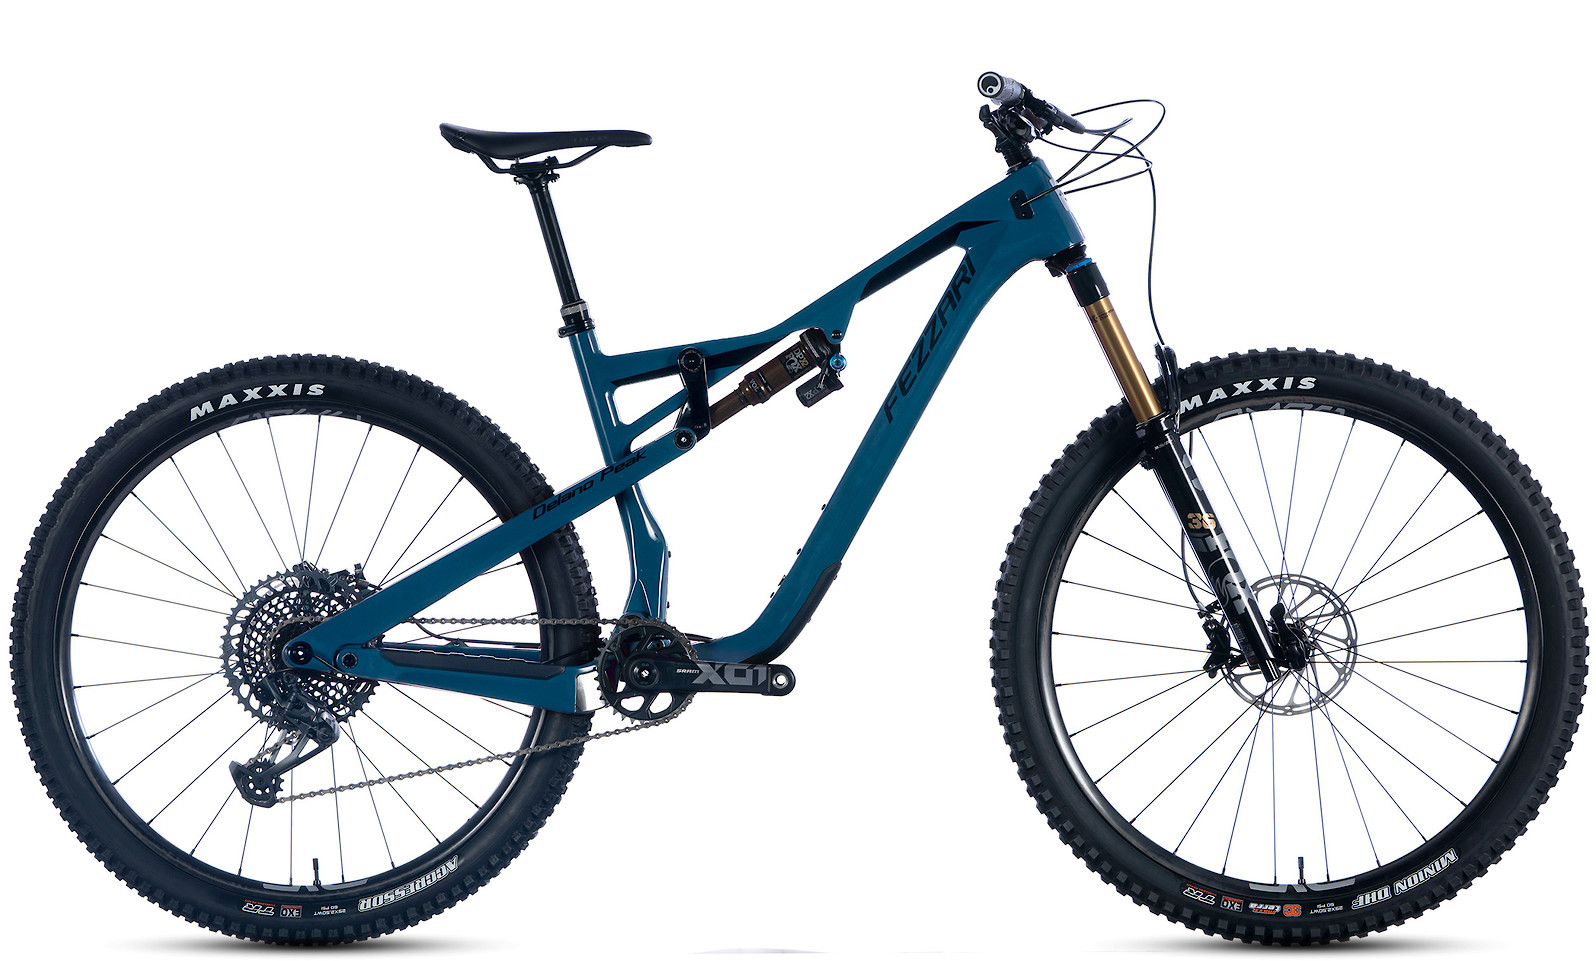 2020 Fezzari Delano Peak Pro (Blue)